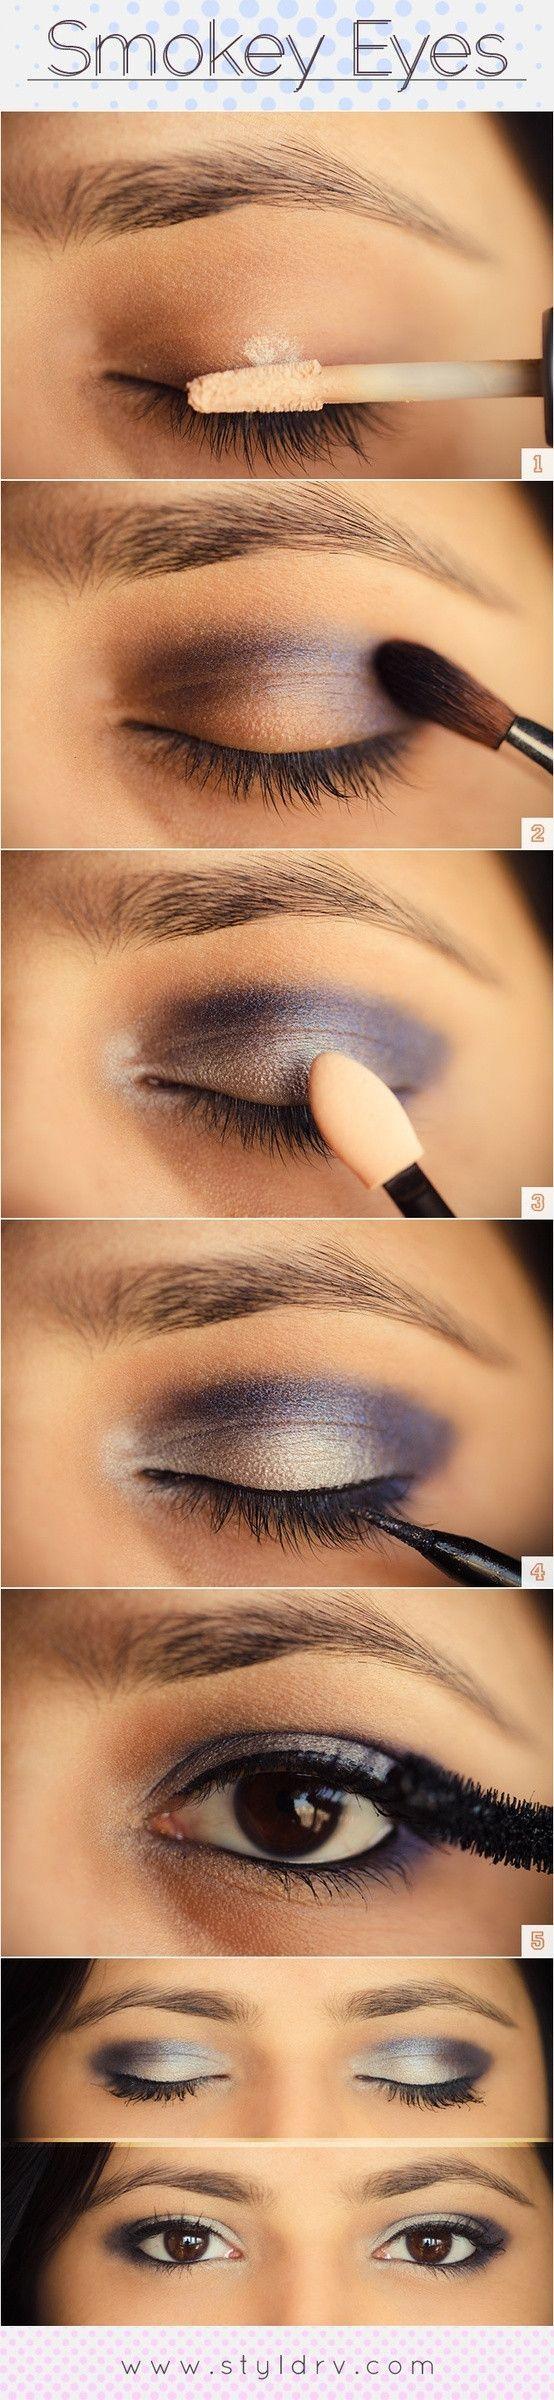 See more makeup tutorials on http://pinmakeuptips.com/best-makeup-tips-for-a-beautiful-natural-look/